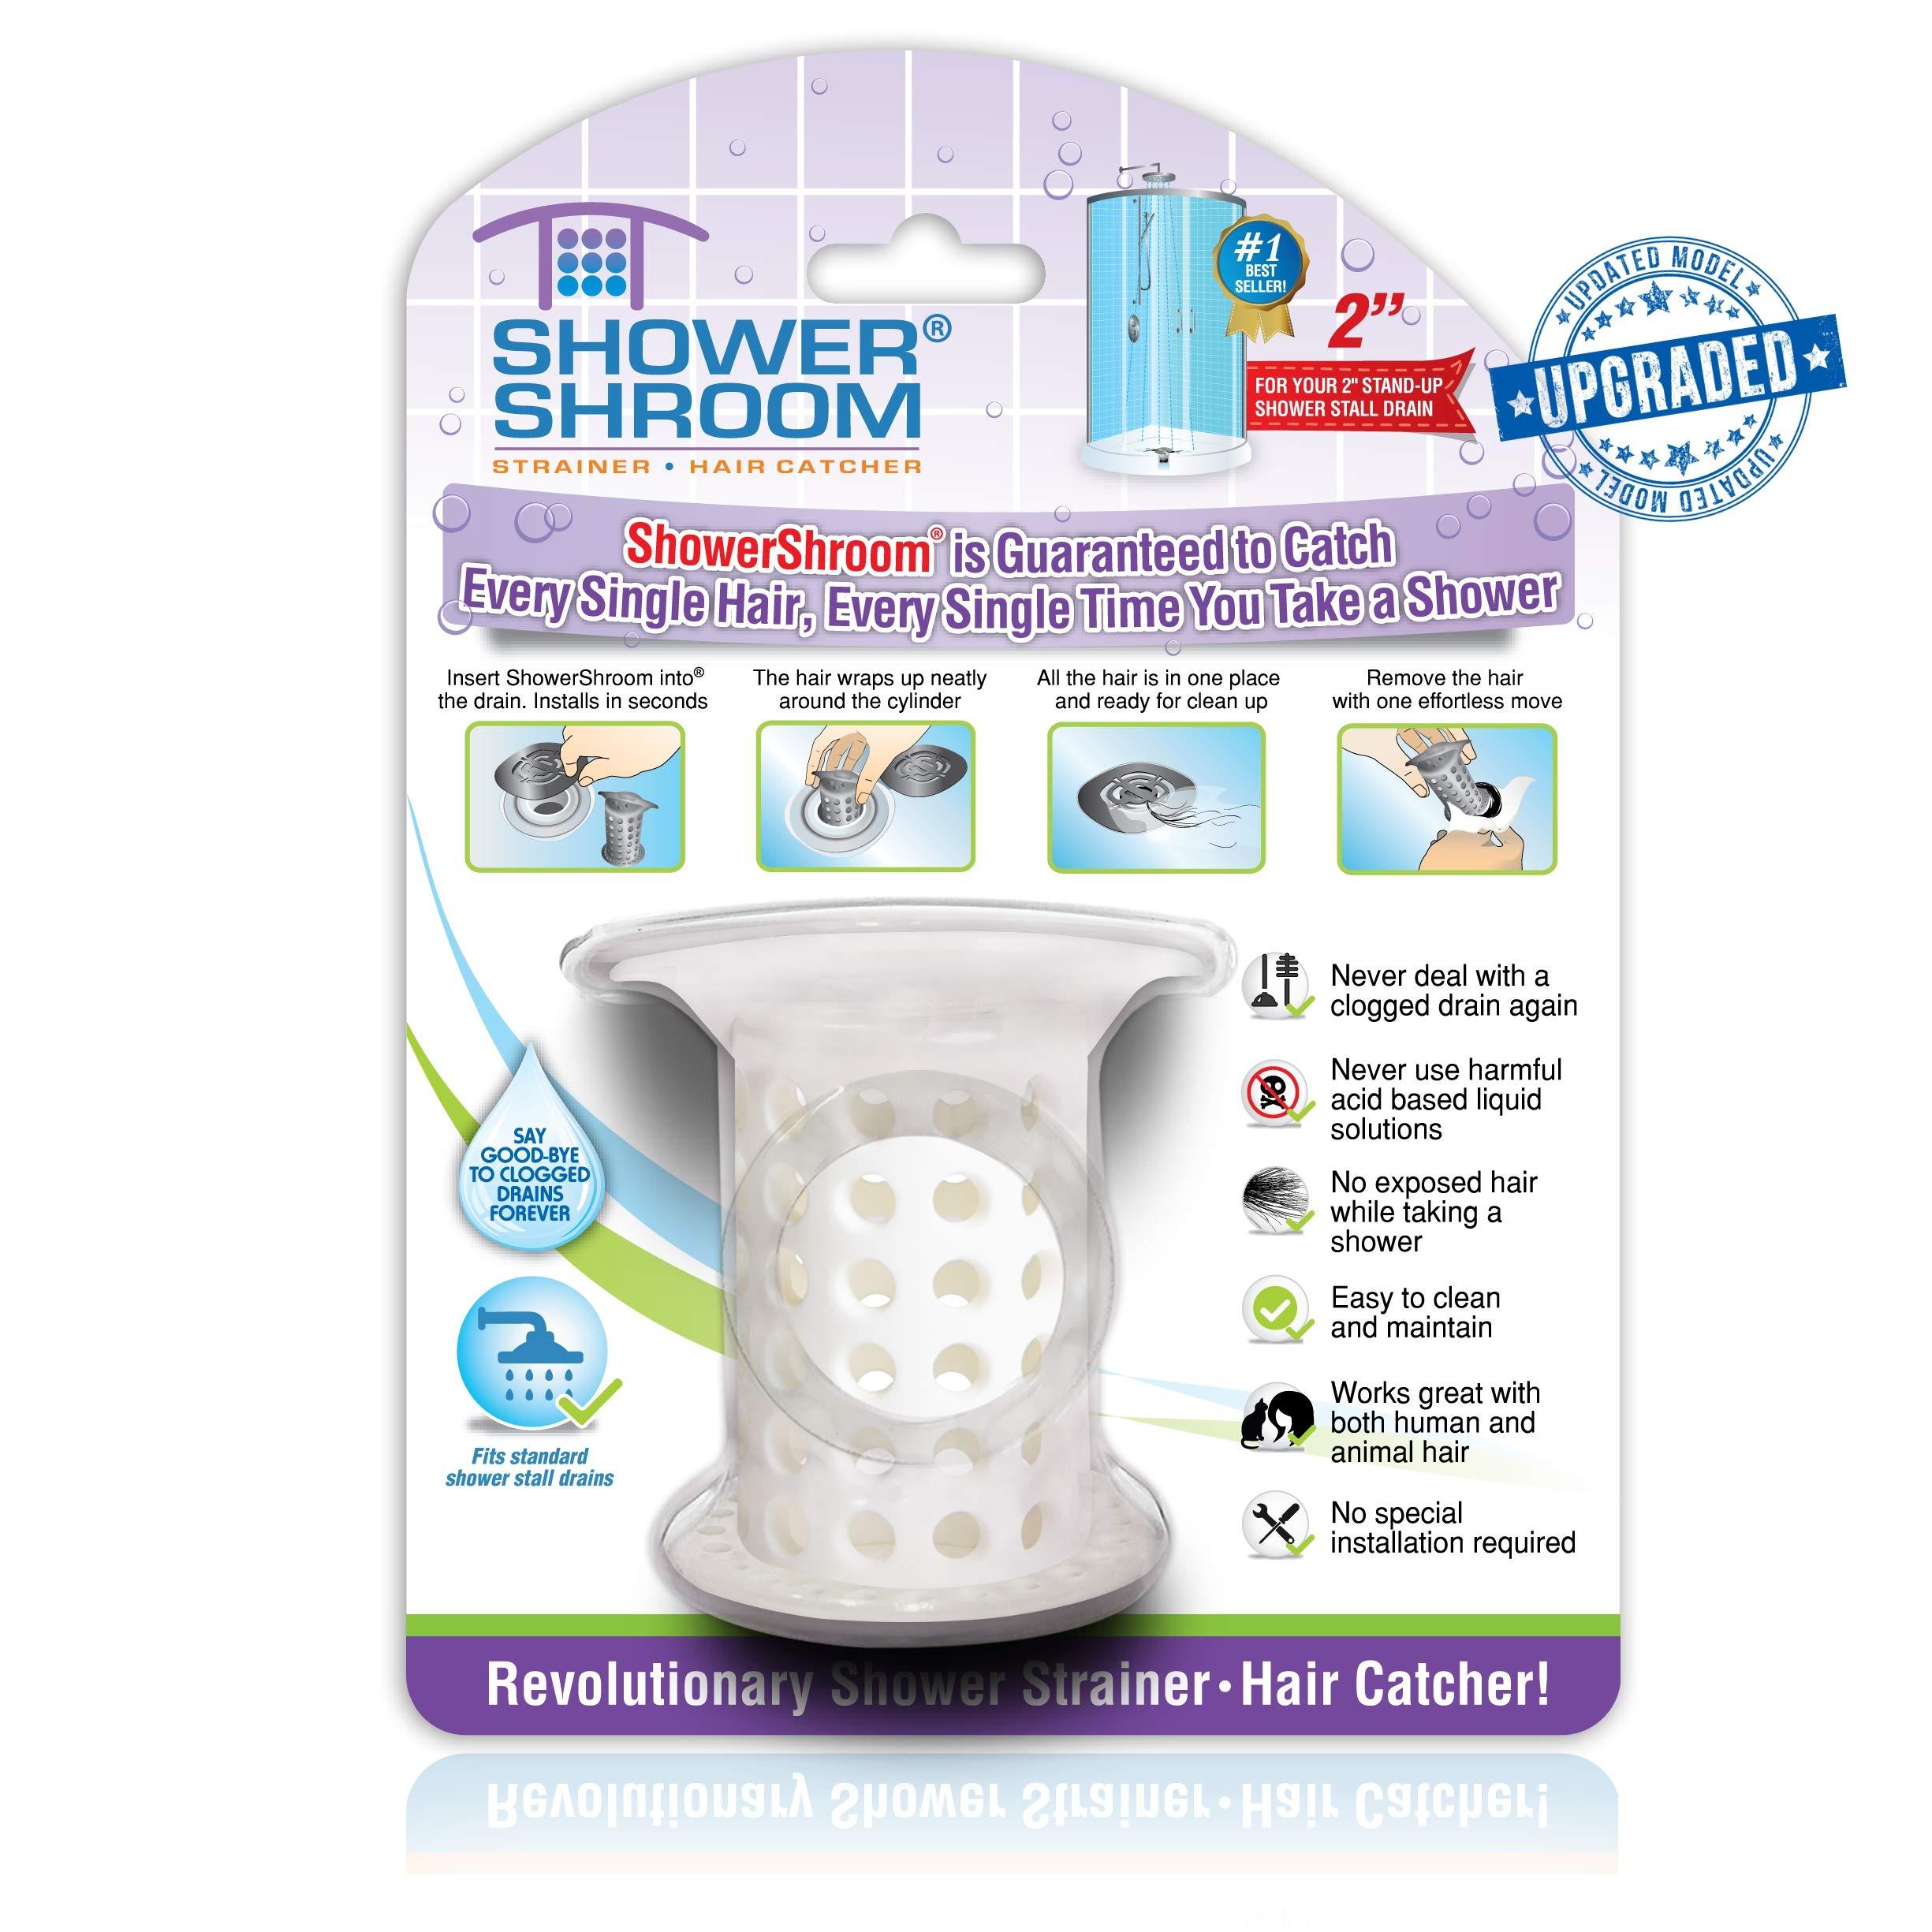 ShowerShroom Revolutionary 2'' Stand-up Shower Stall Drain Protector Hair Catcher/Strainer 2'', White